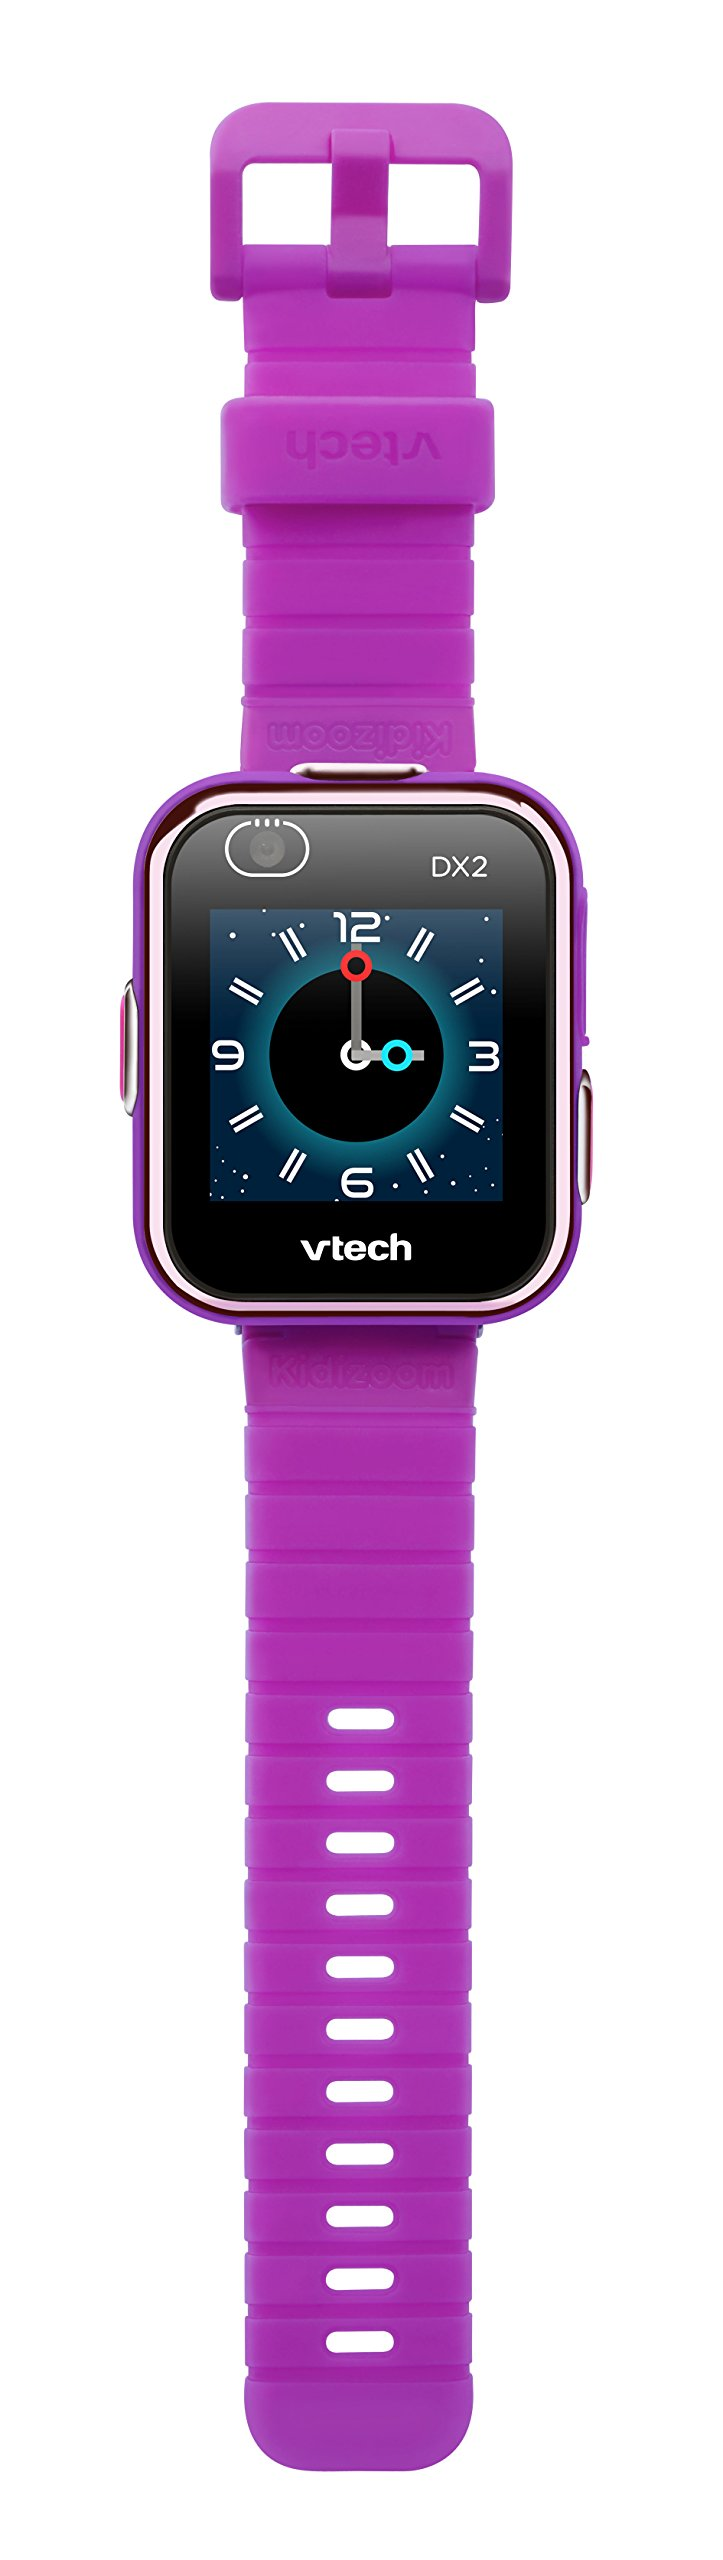 VTech Kidizoom Smartwatch DX2 Purple (Frustration Free Packaging) by VTech (Image #2)